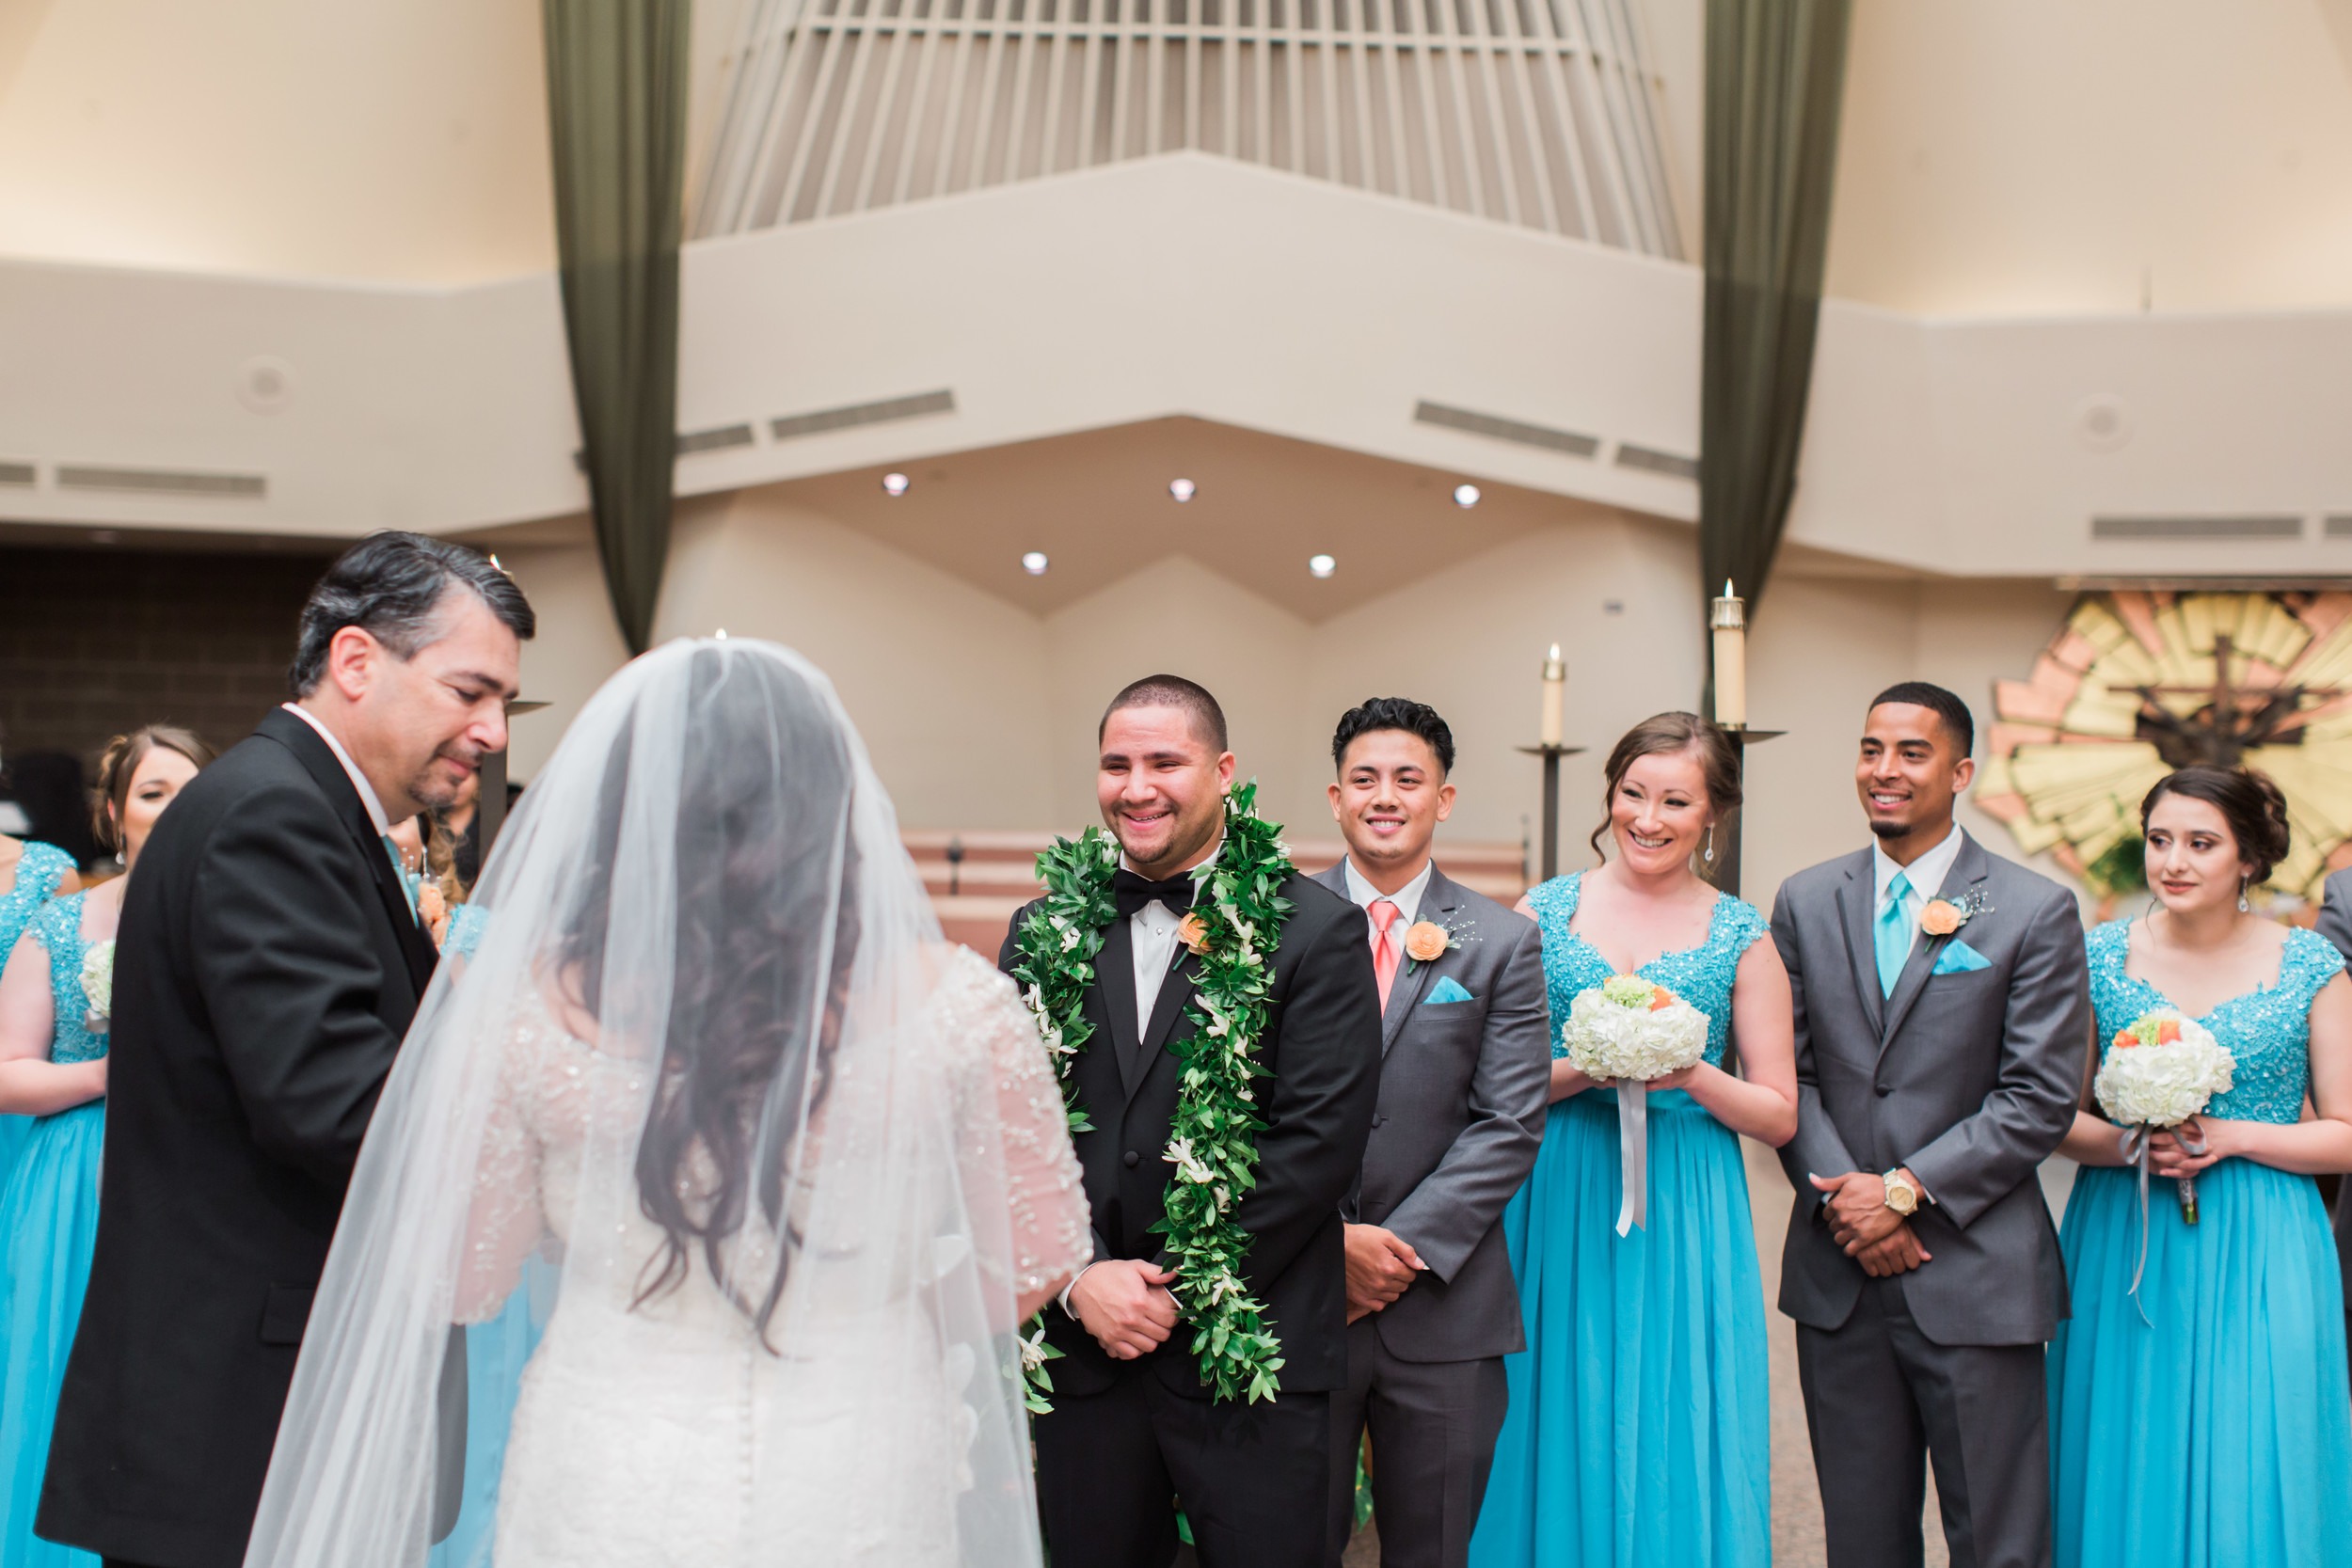 hawaiian-inspired-wedding-at-blackhawk-country-club-1865.jpg